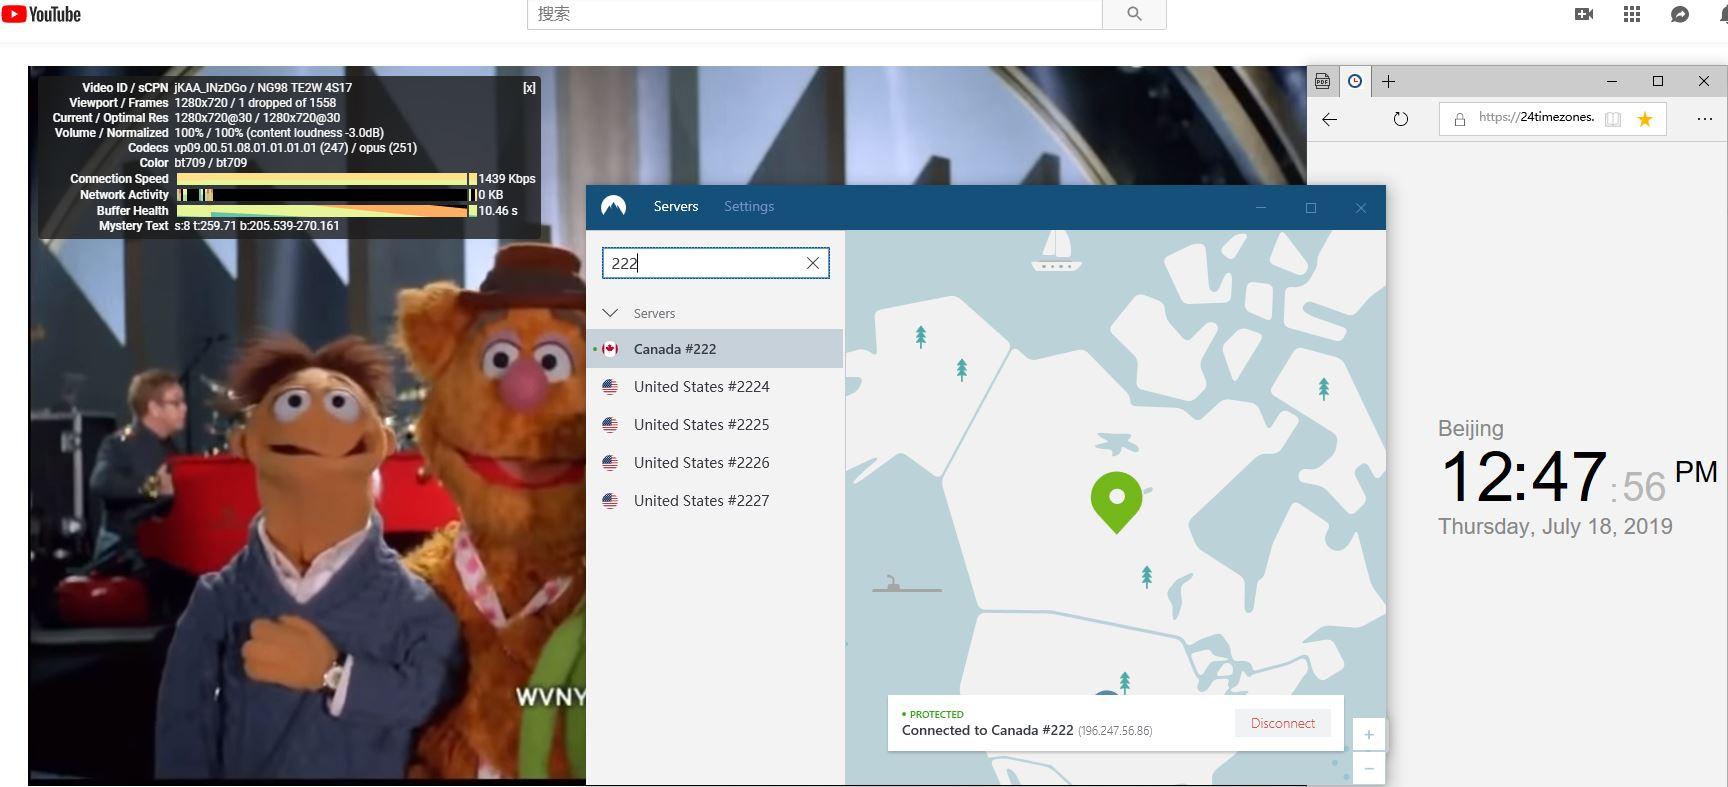 NordVPN Windows 翻墙 科学上午 加拿大-222服务器 YouTube速度测试--20190718